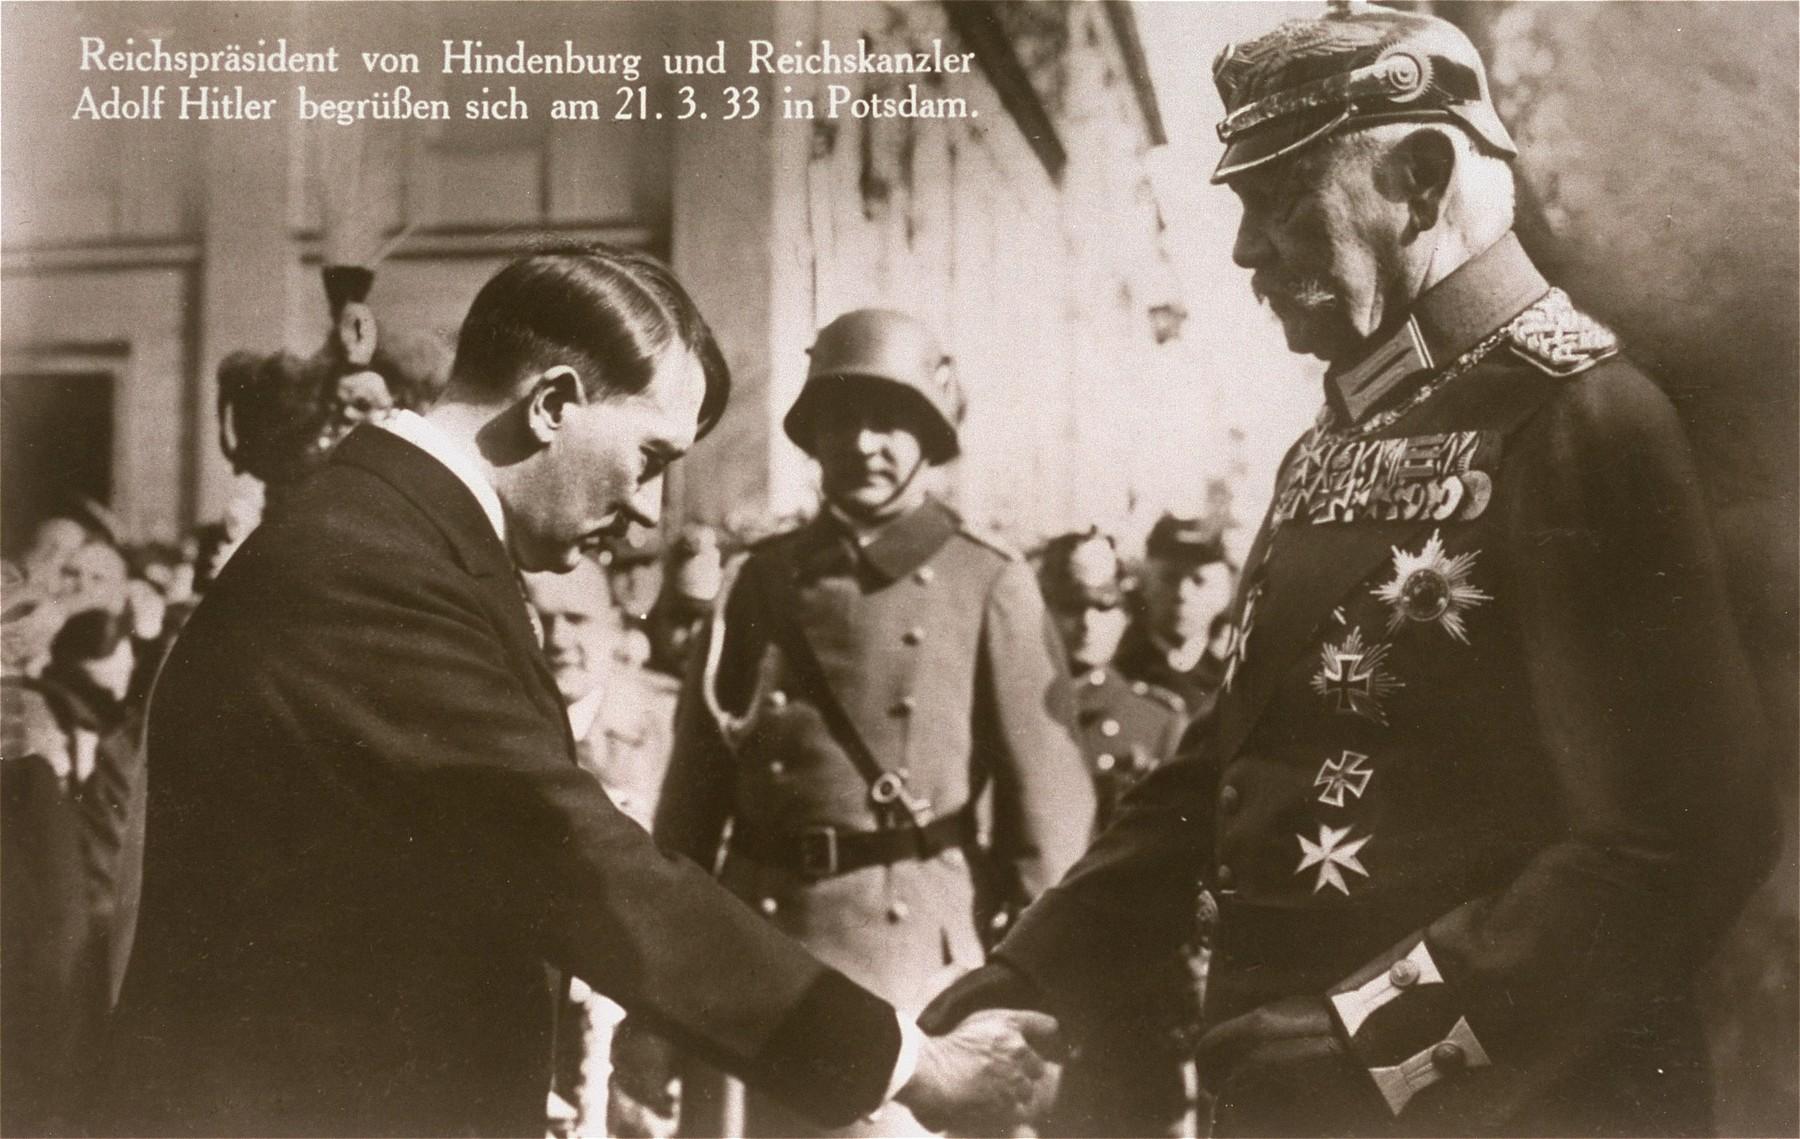 German chancellor Adolf Hitler greets President Paul von Hindenburg during opening ceremonies for the new Reichstag in Potsdam.